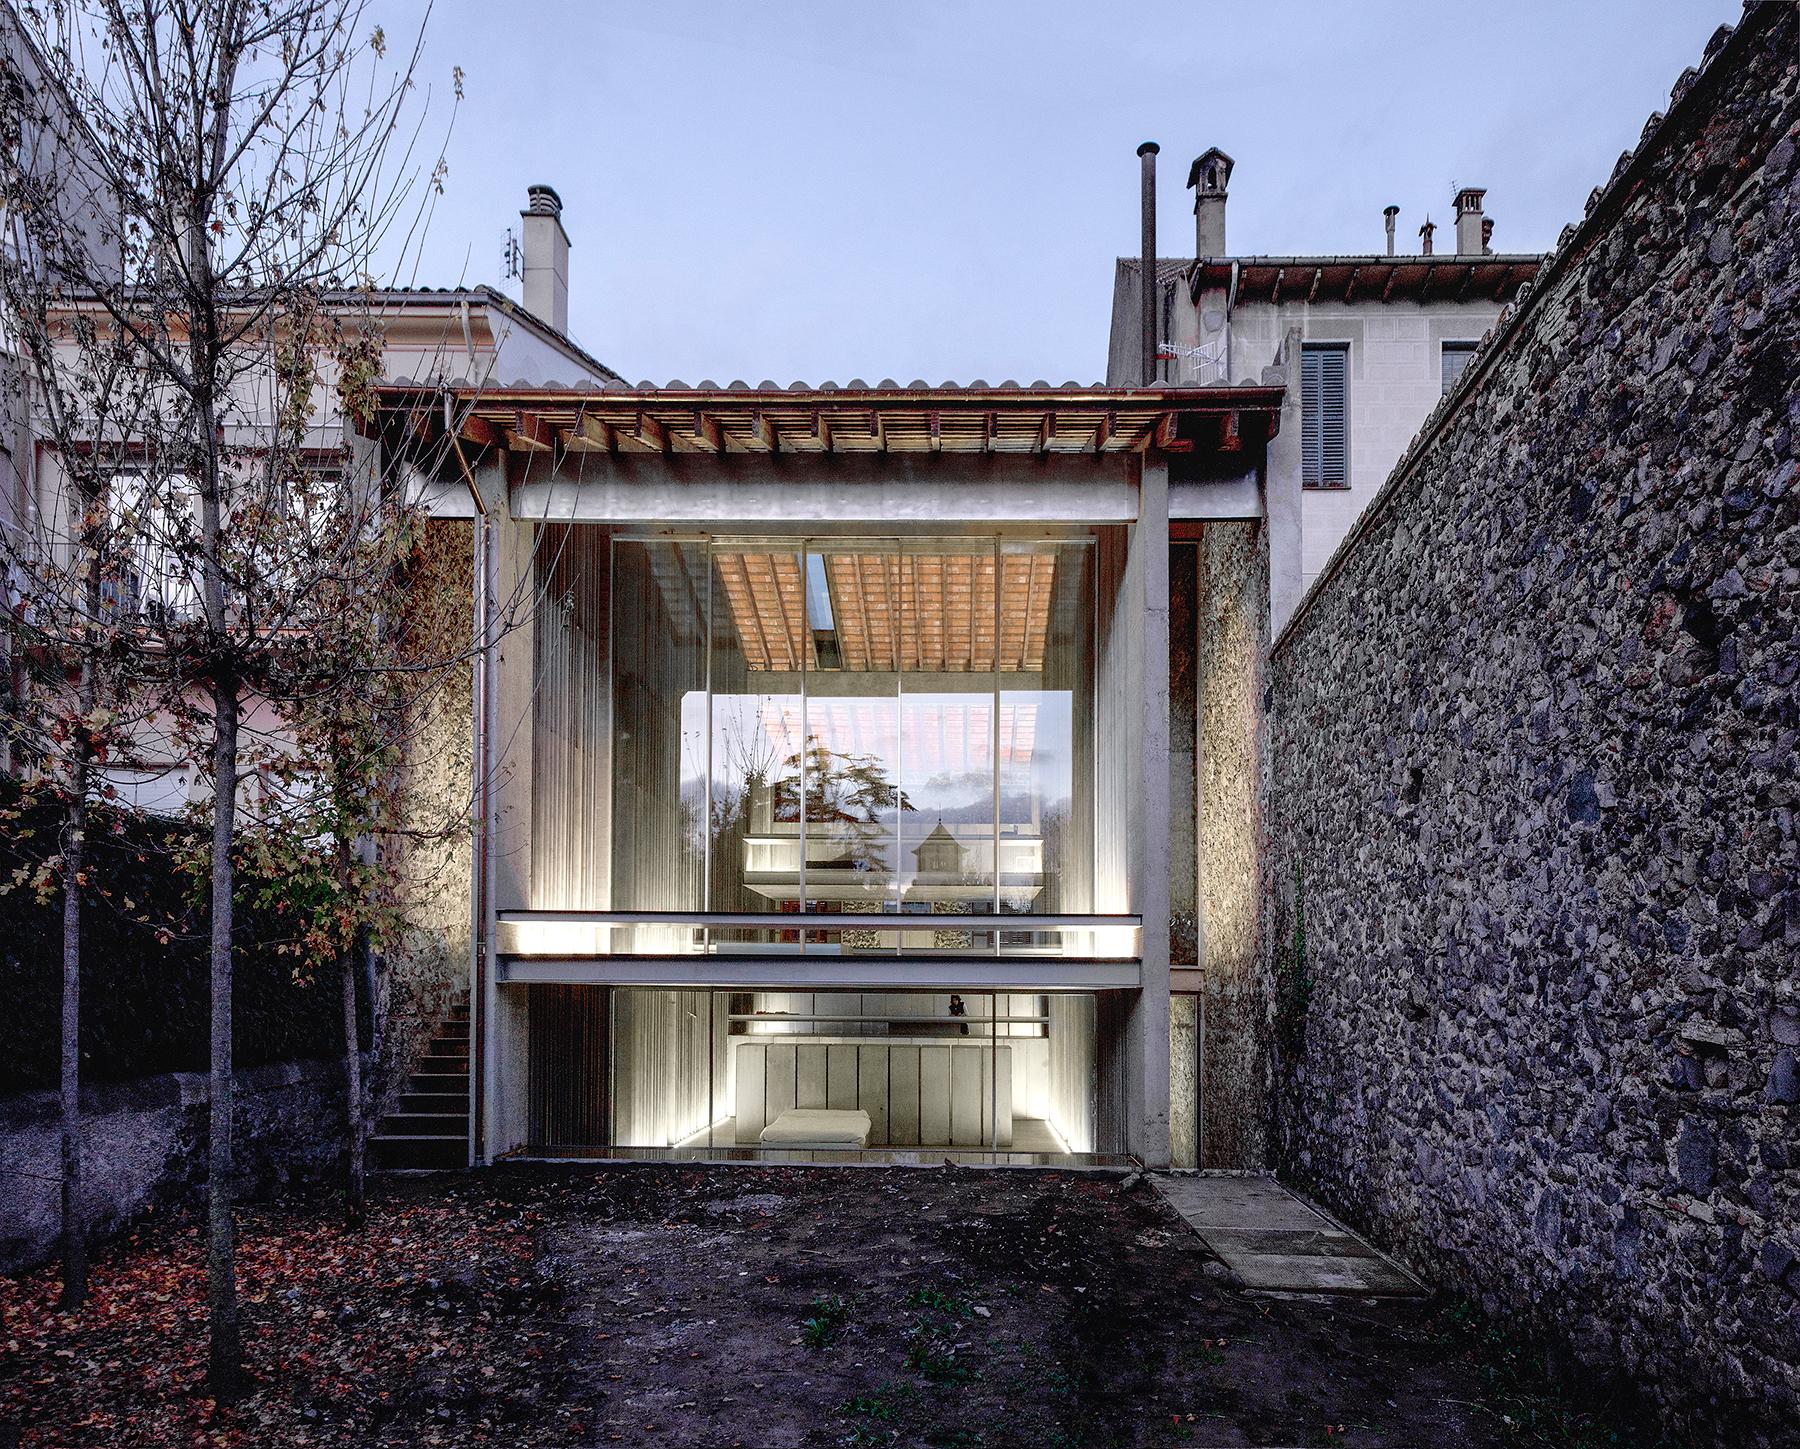 Row House (Olot, Girona)